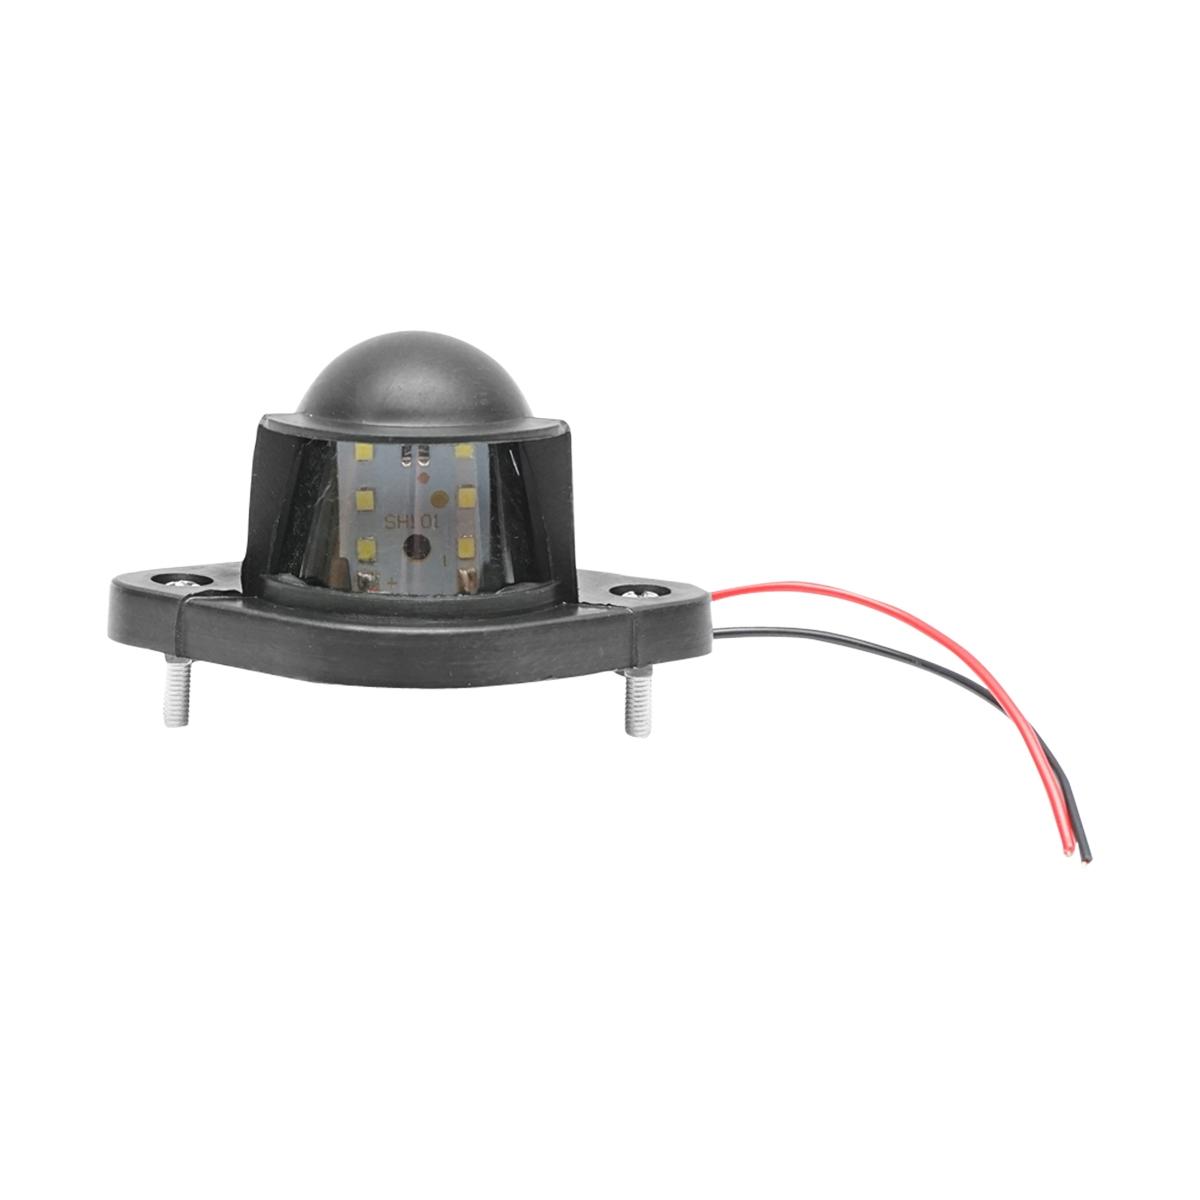 Lampa iluminare placuta inmatriculare camion 72x70, LED 12/24V Breckner Germany